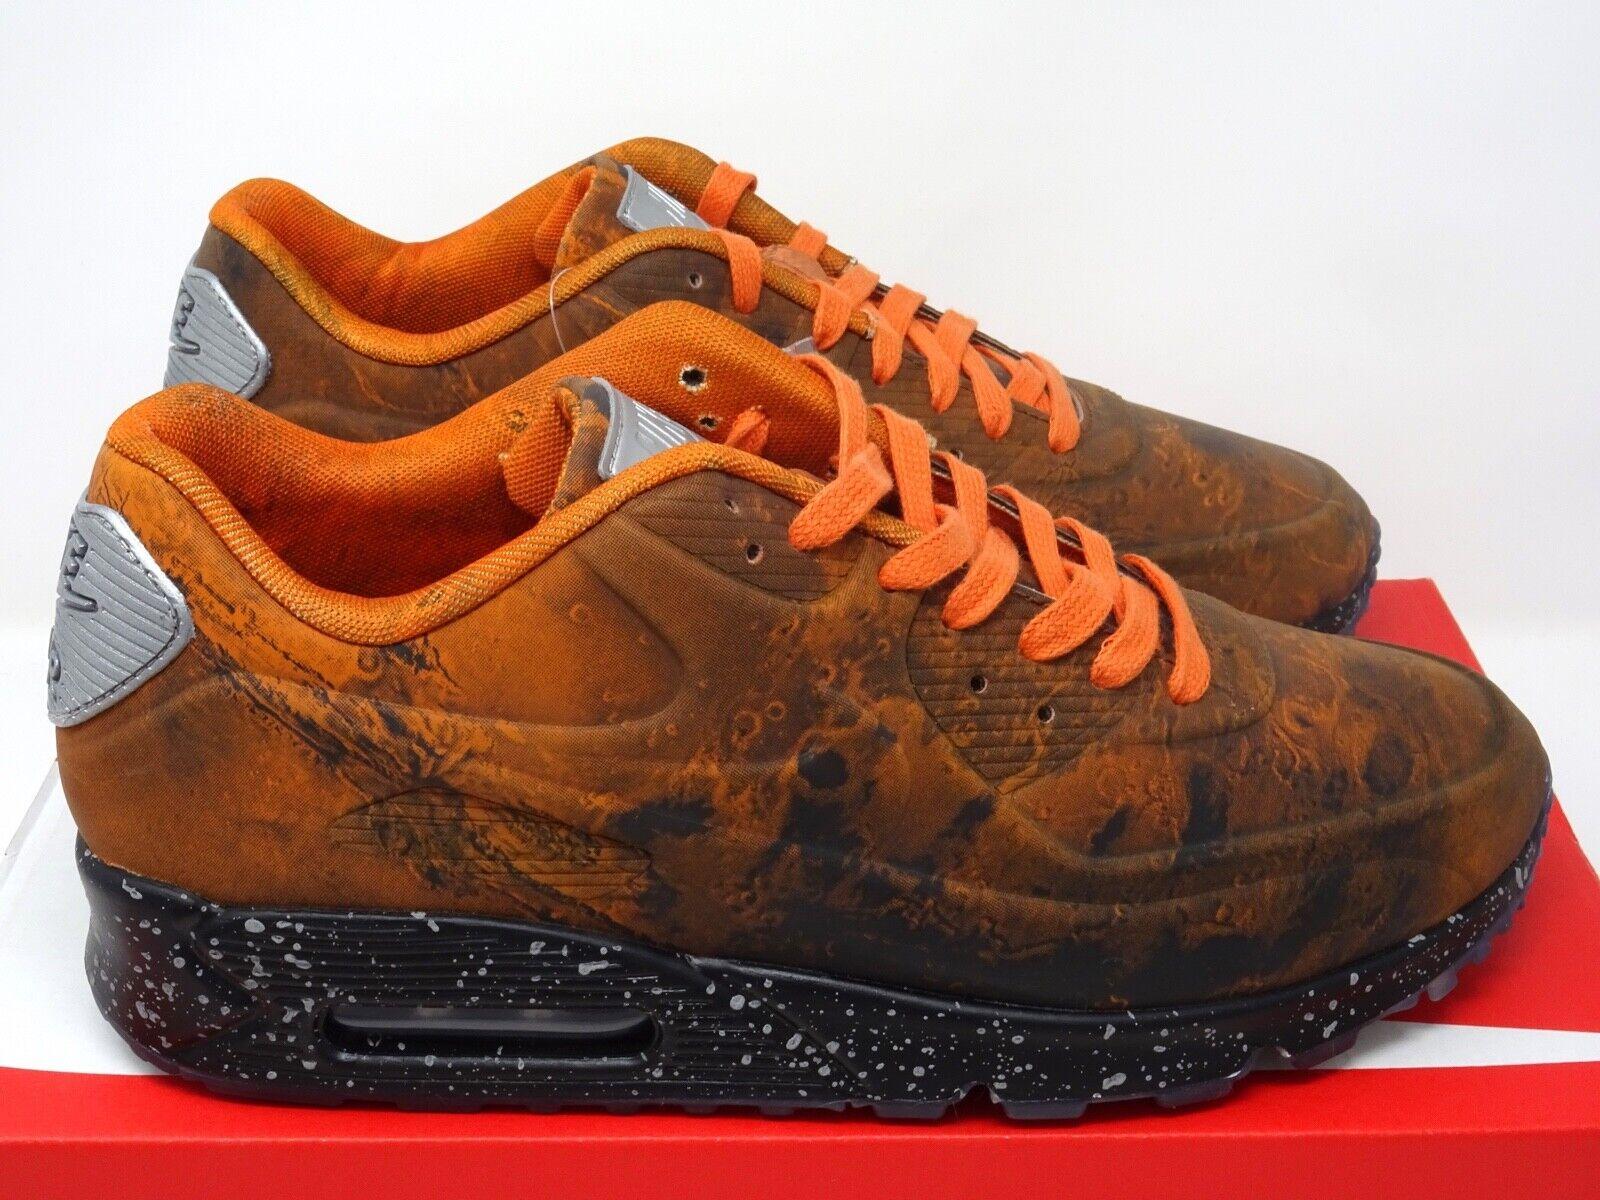 Nike Air Max 90 QS Mars Landing Mars Stone Magma orange UK 5 6 7 8 9 10 11 12 US